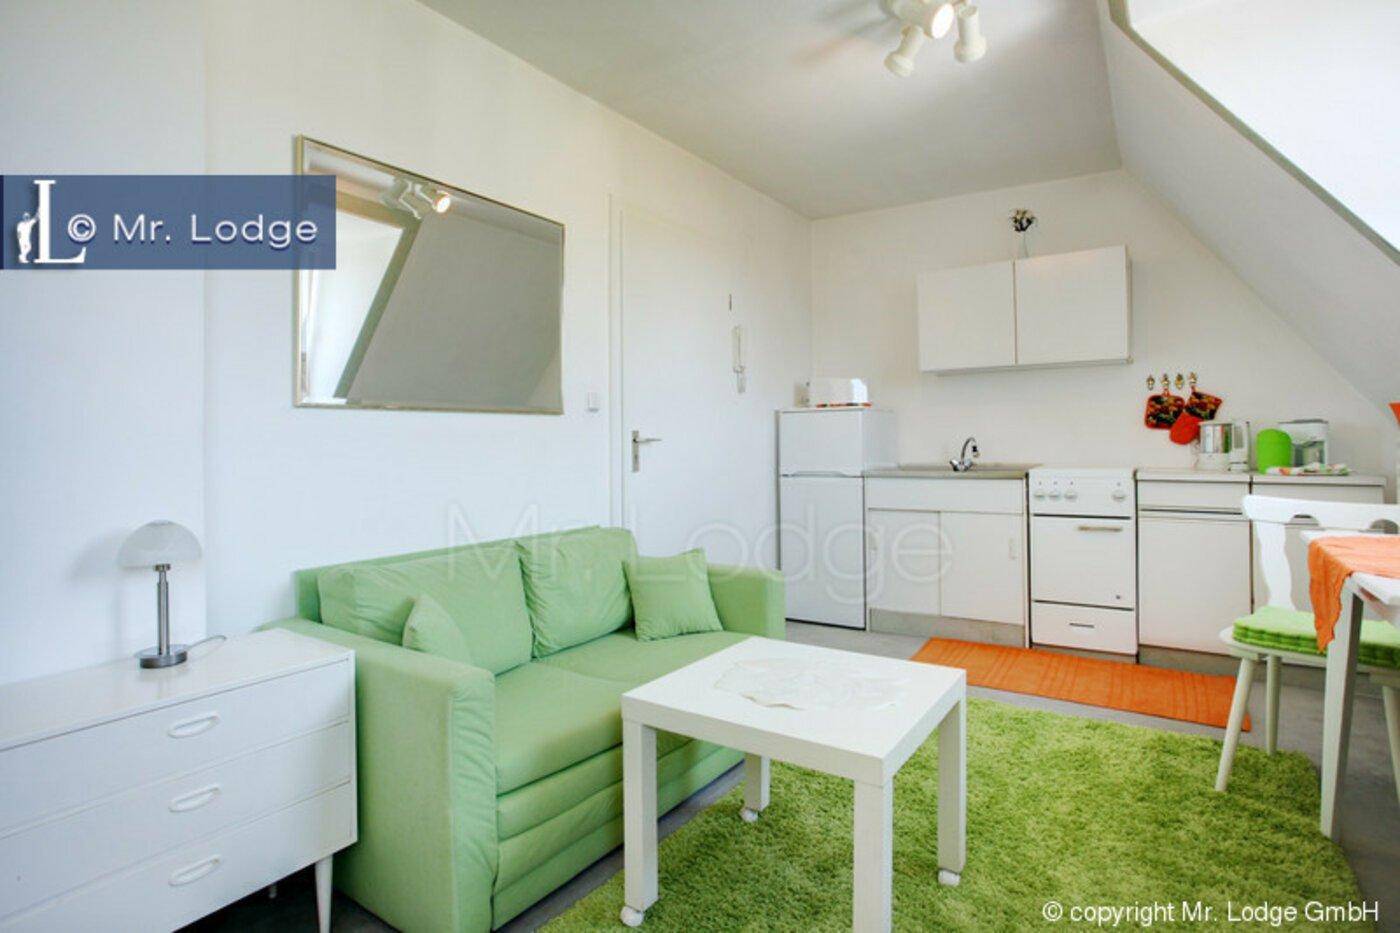 1 zimmer apartment m bliert flughafenlinie s8 m nchen obermenzing 469. Black Bedroom Furniture Sets. Home Design Ideas